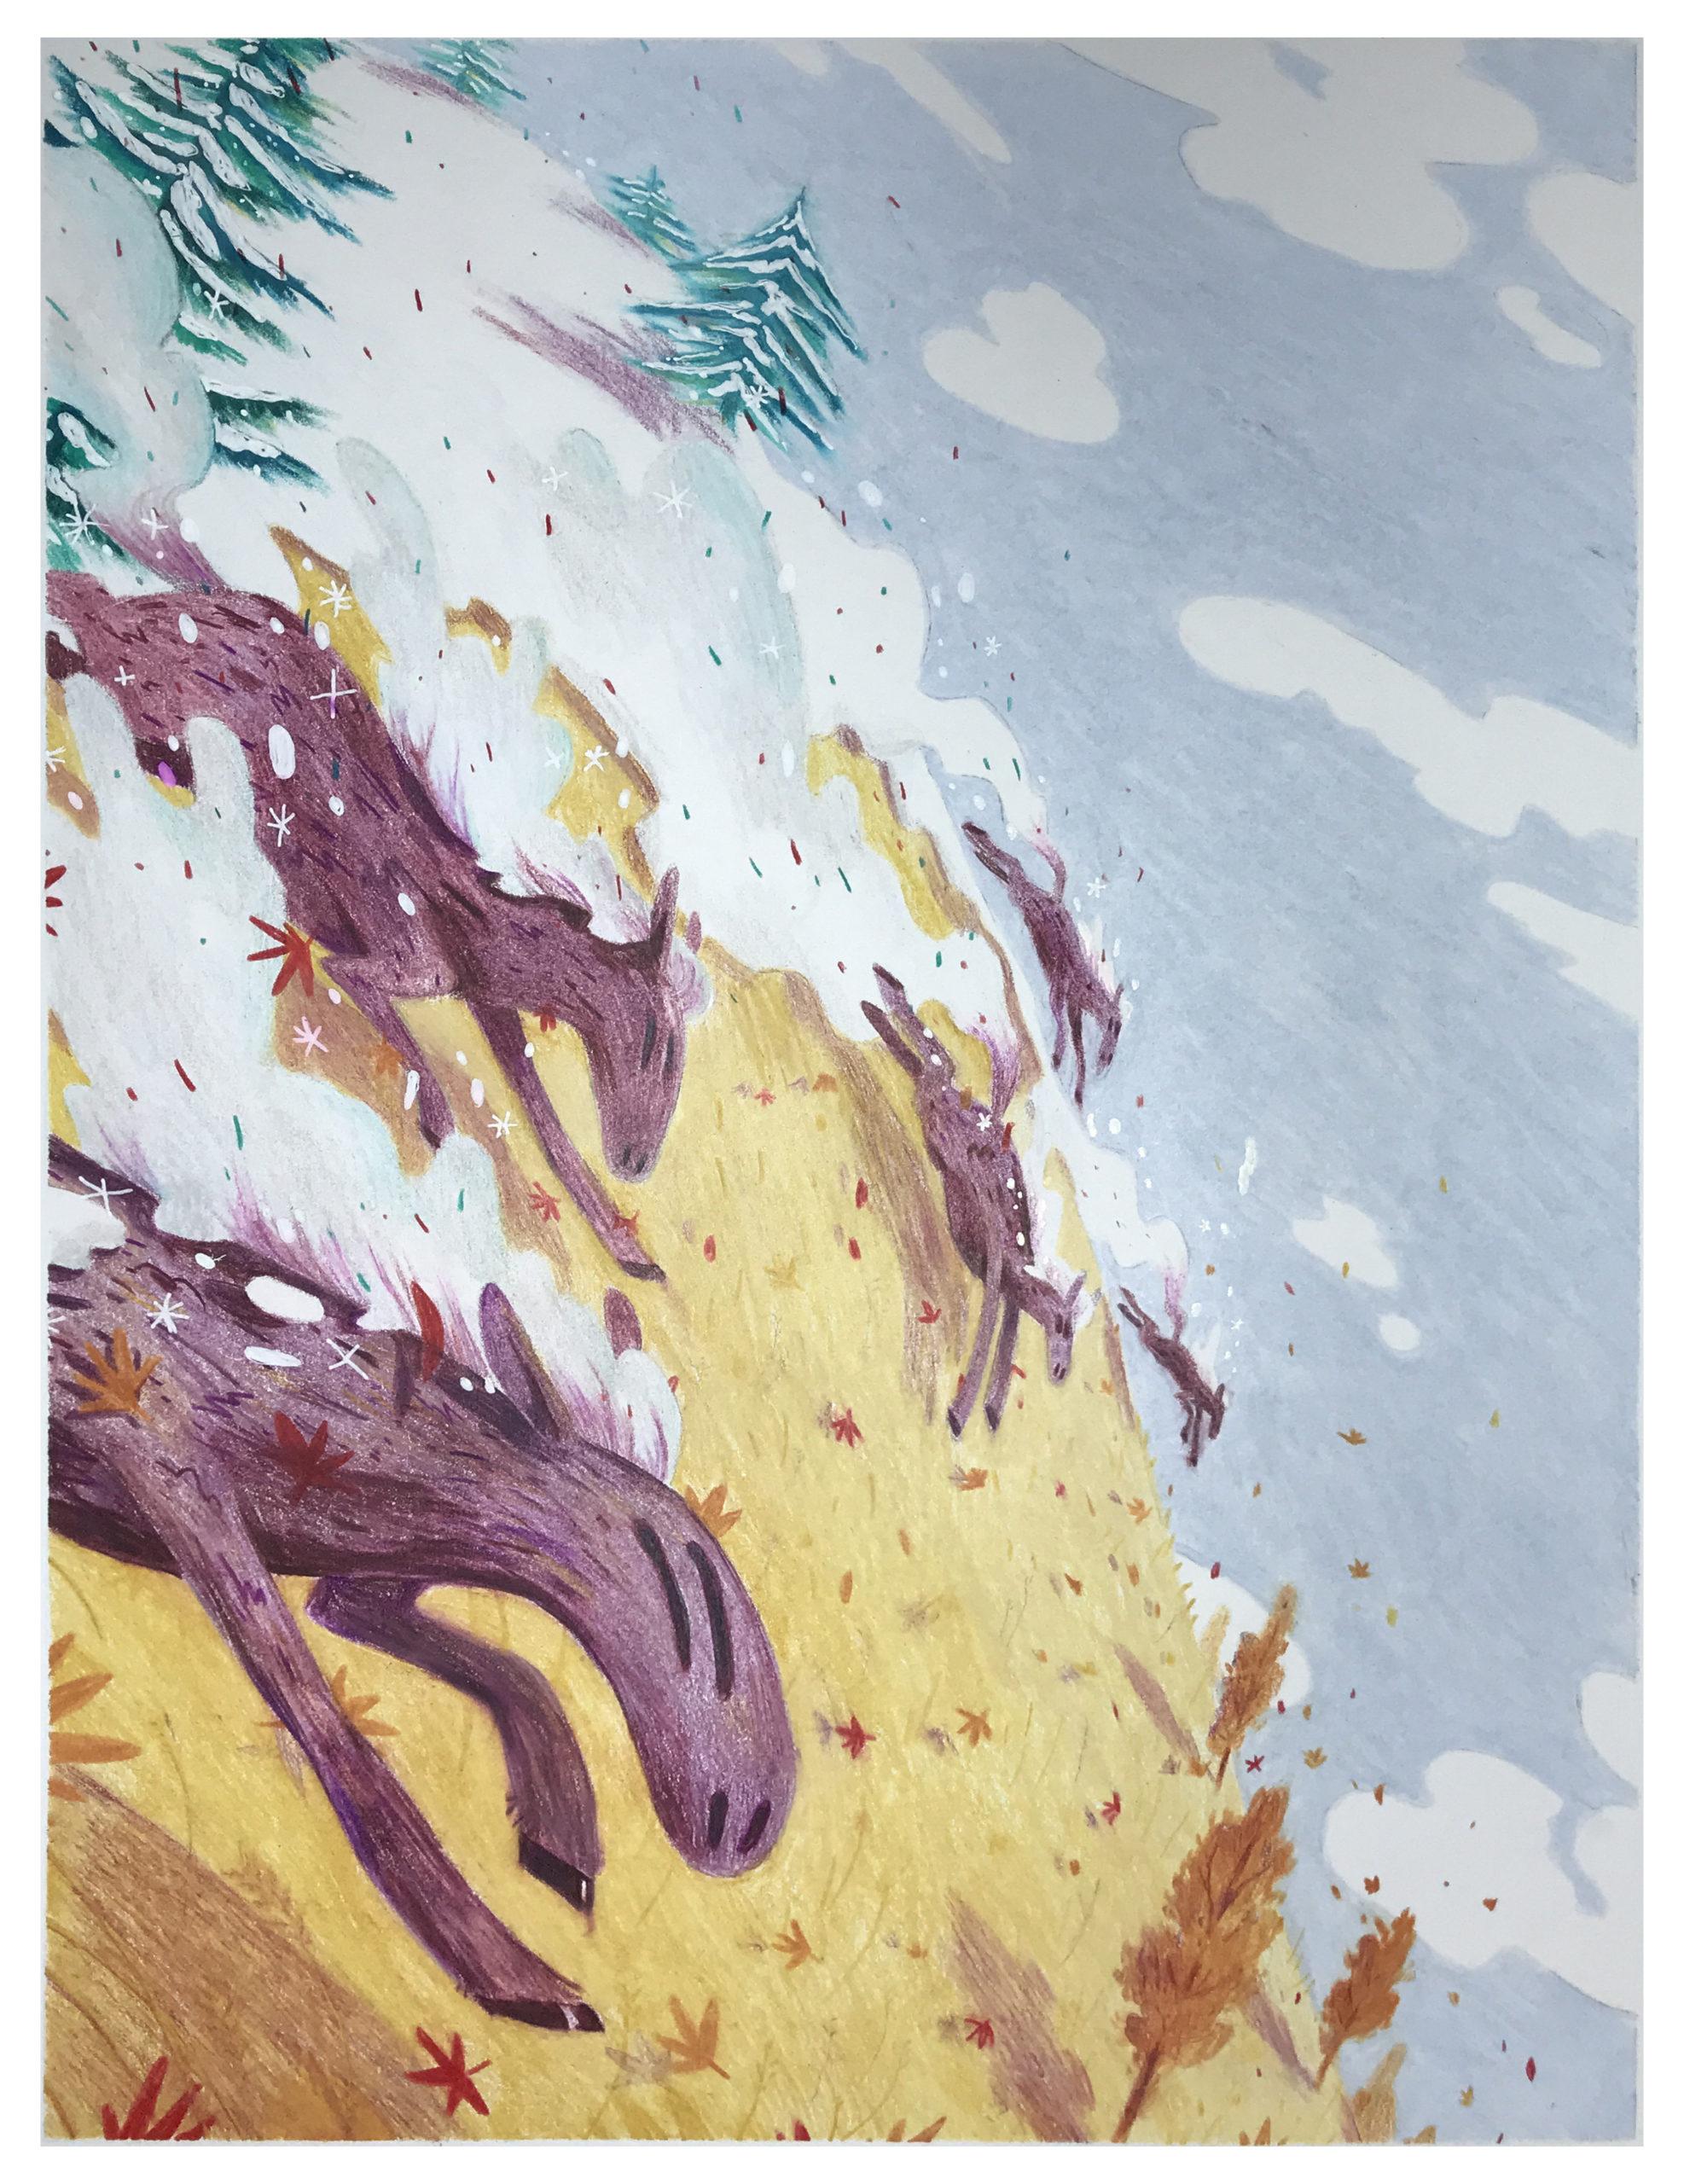 Vivaldi Four Seasons student artwork from MassArt, Caroline Barlow